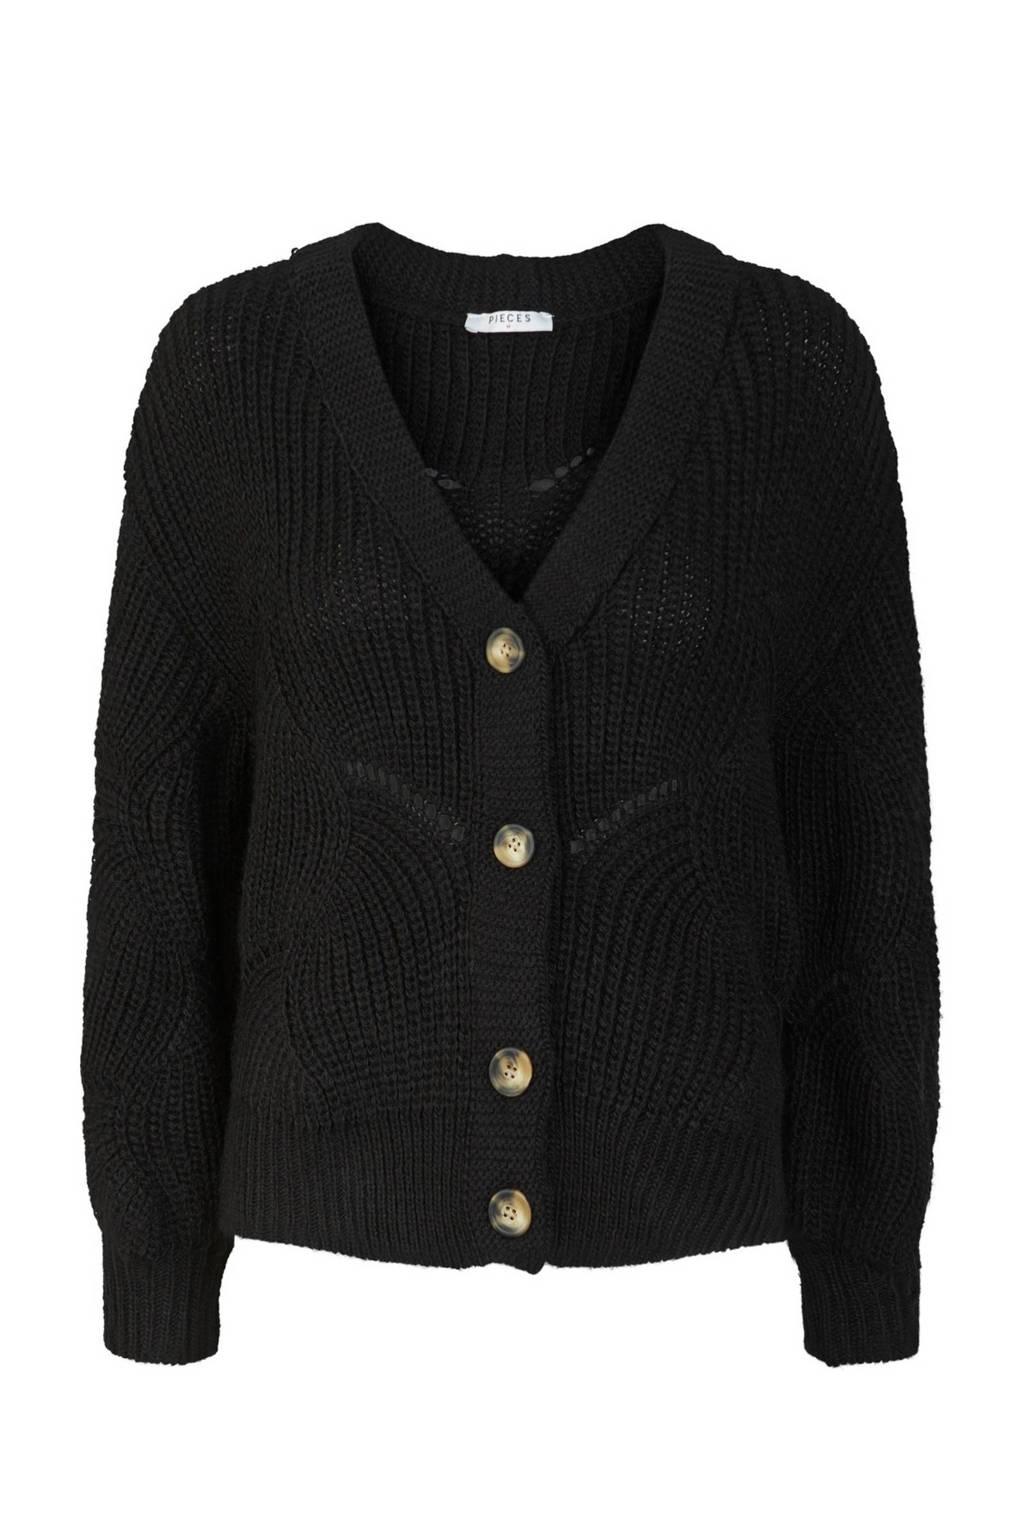 PIECES vest zwart, Zwart